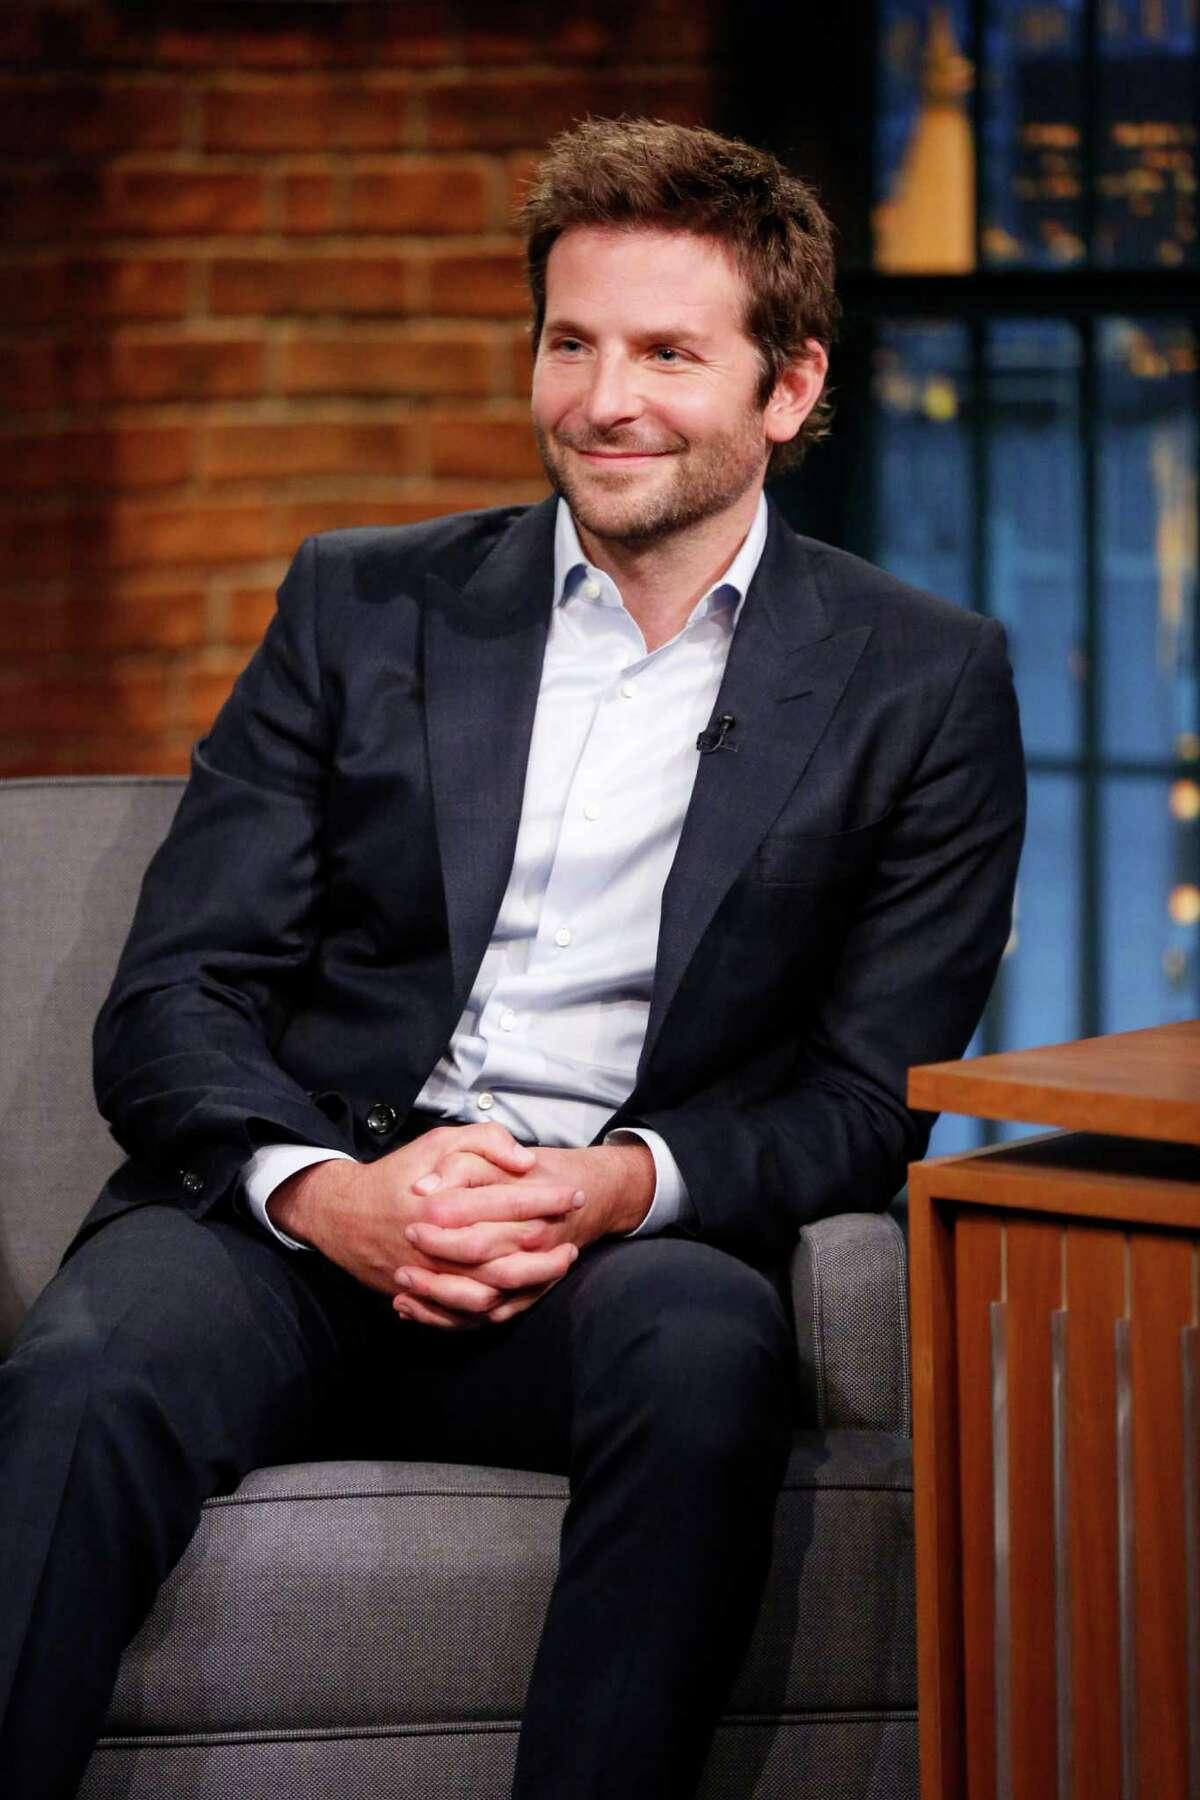 VILLANOVA Bradley Cooper: The